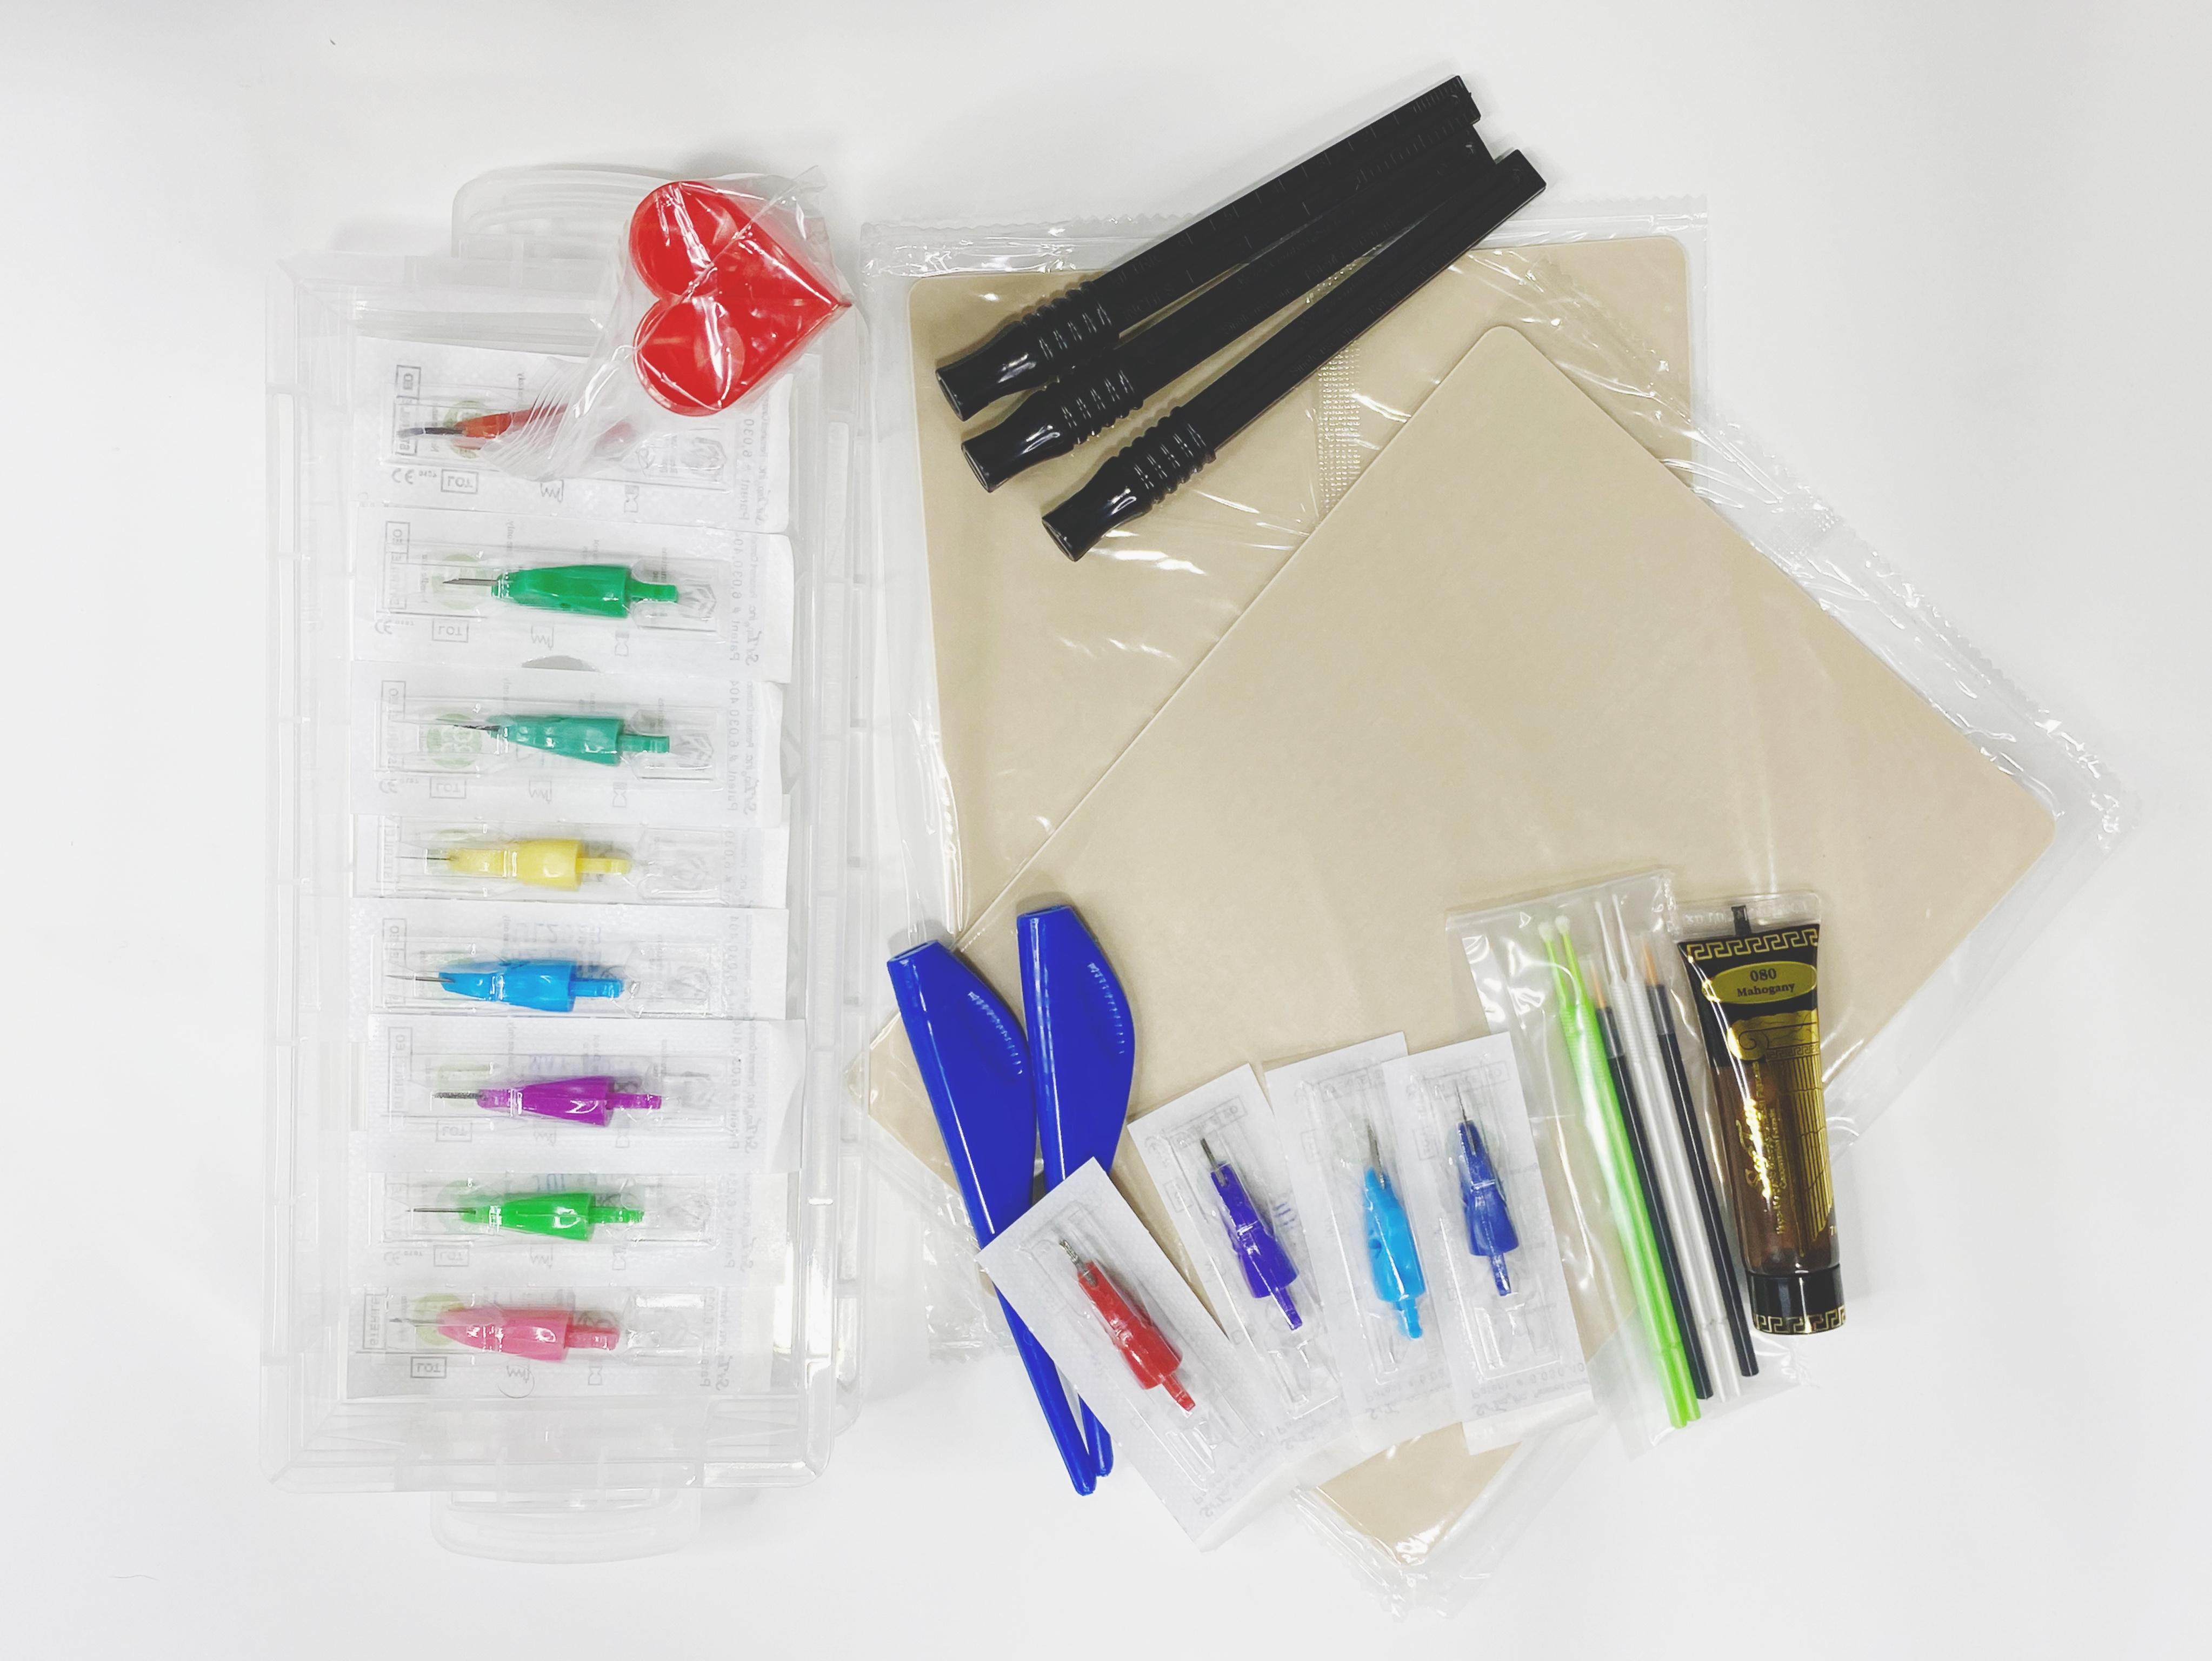 Optional Practice Kit ($70)